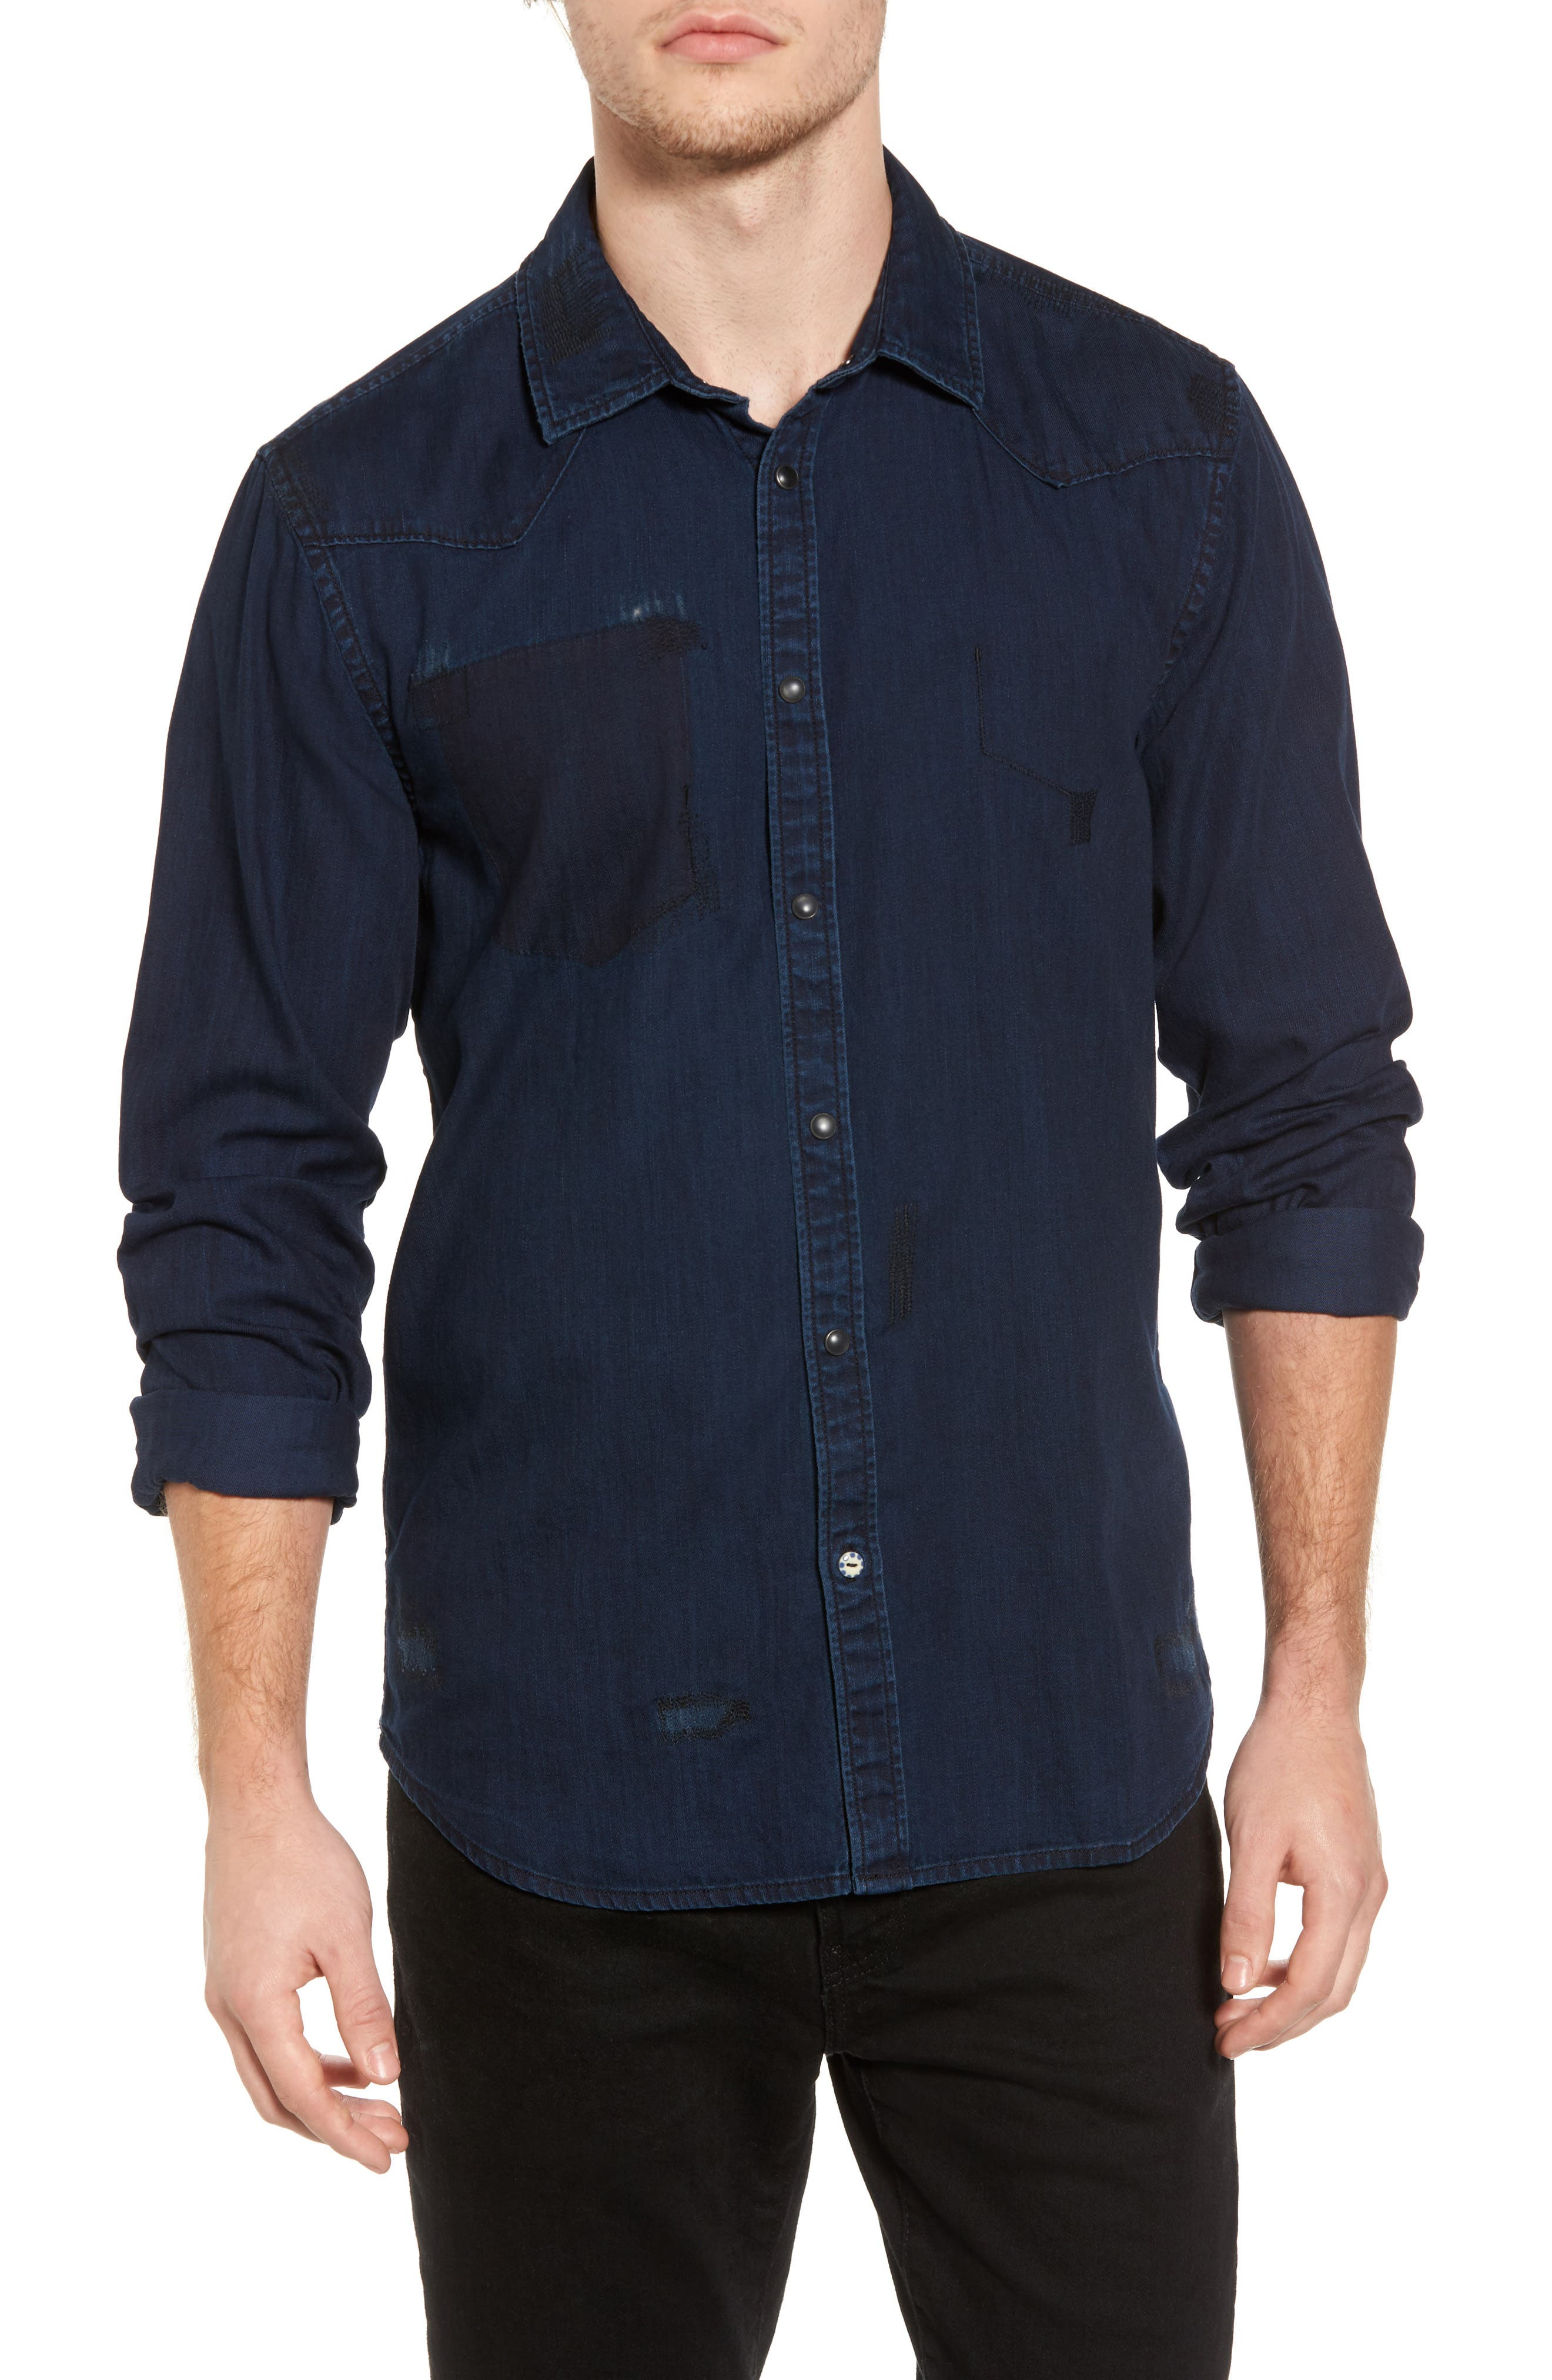 Pocketless Western Denim Shirt,                             Main thumbnail 1, color,